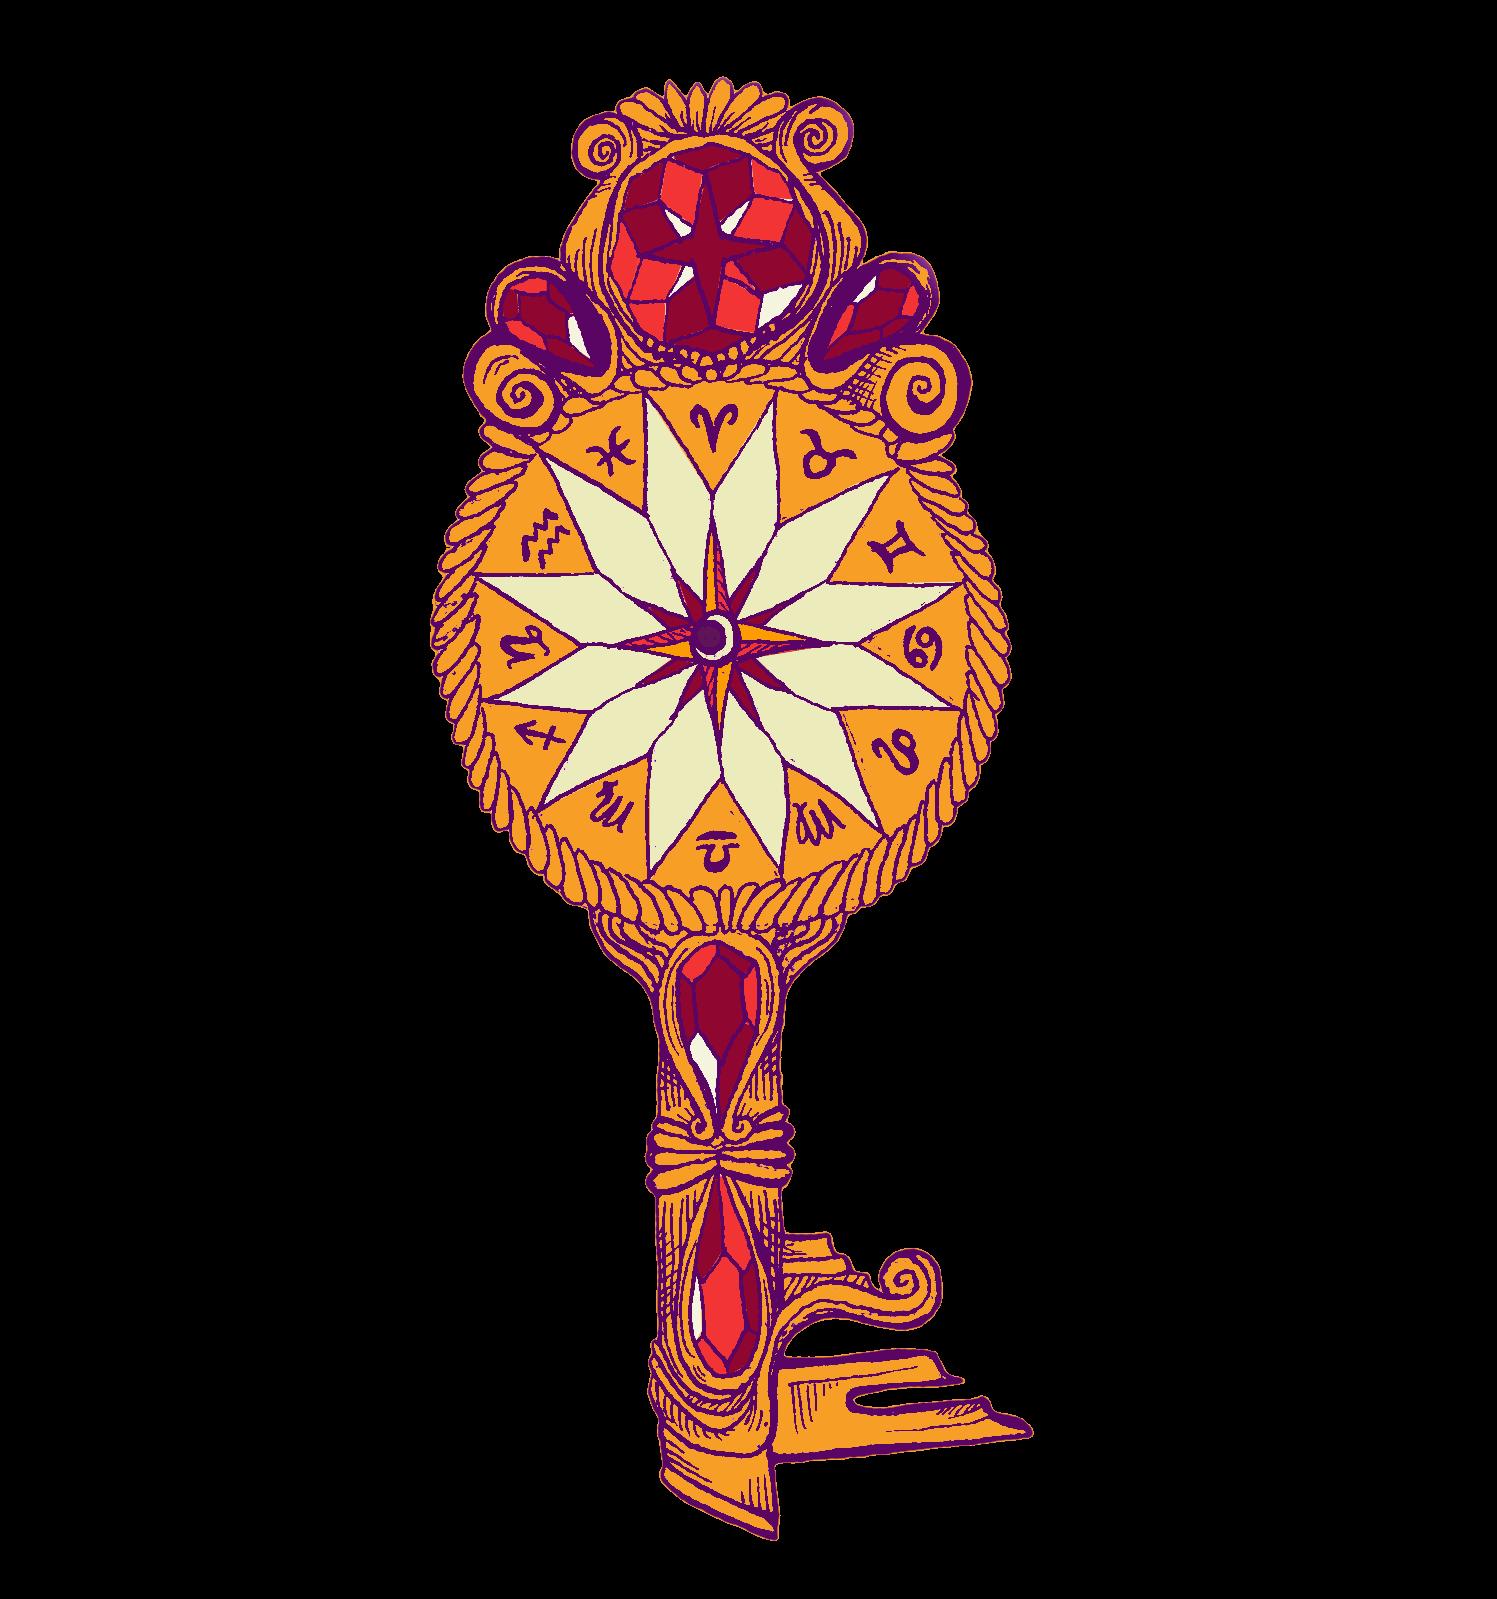 jewel-decked astrology key